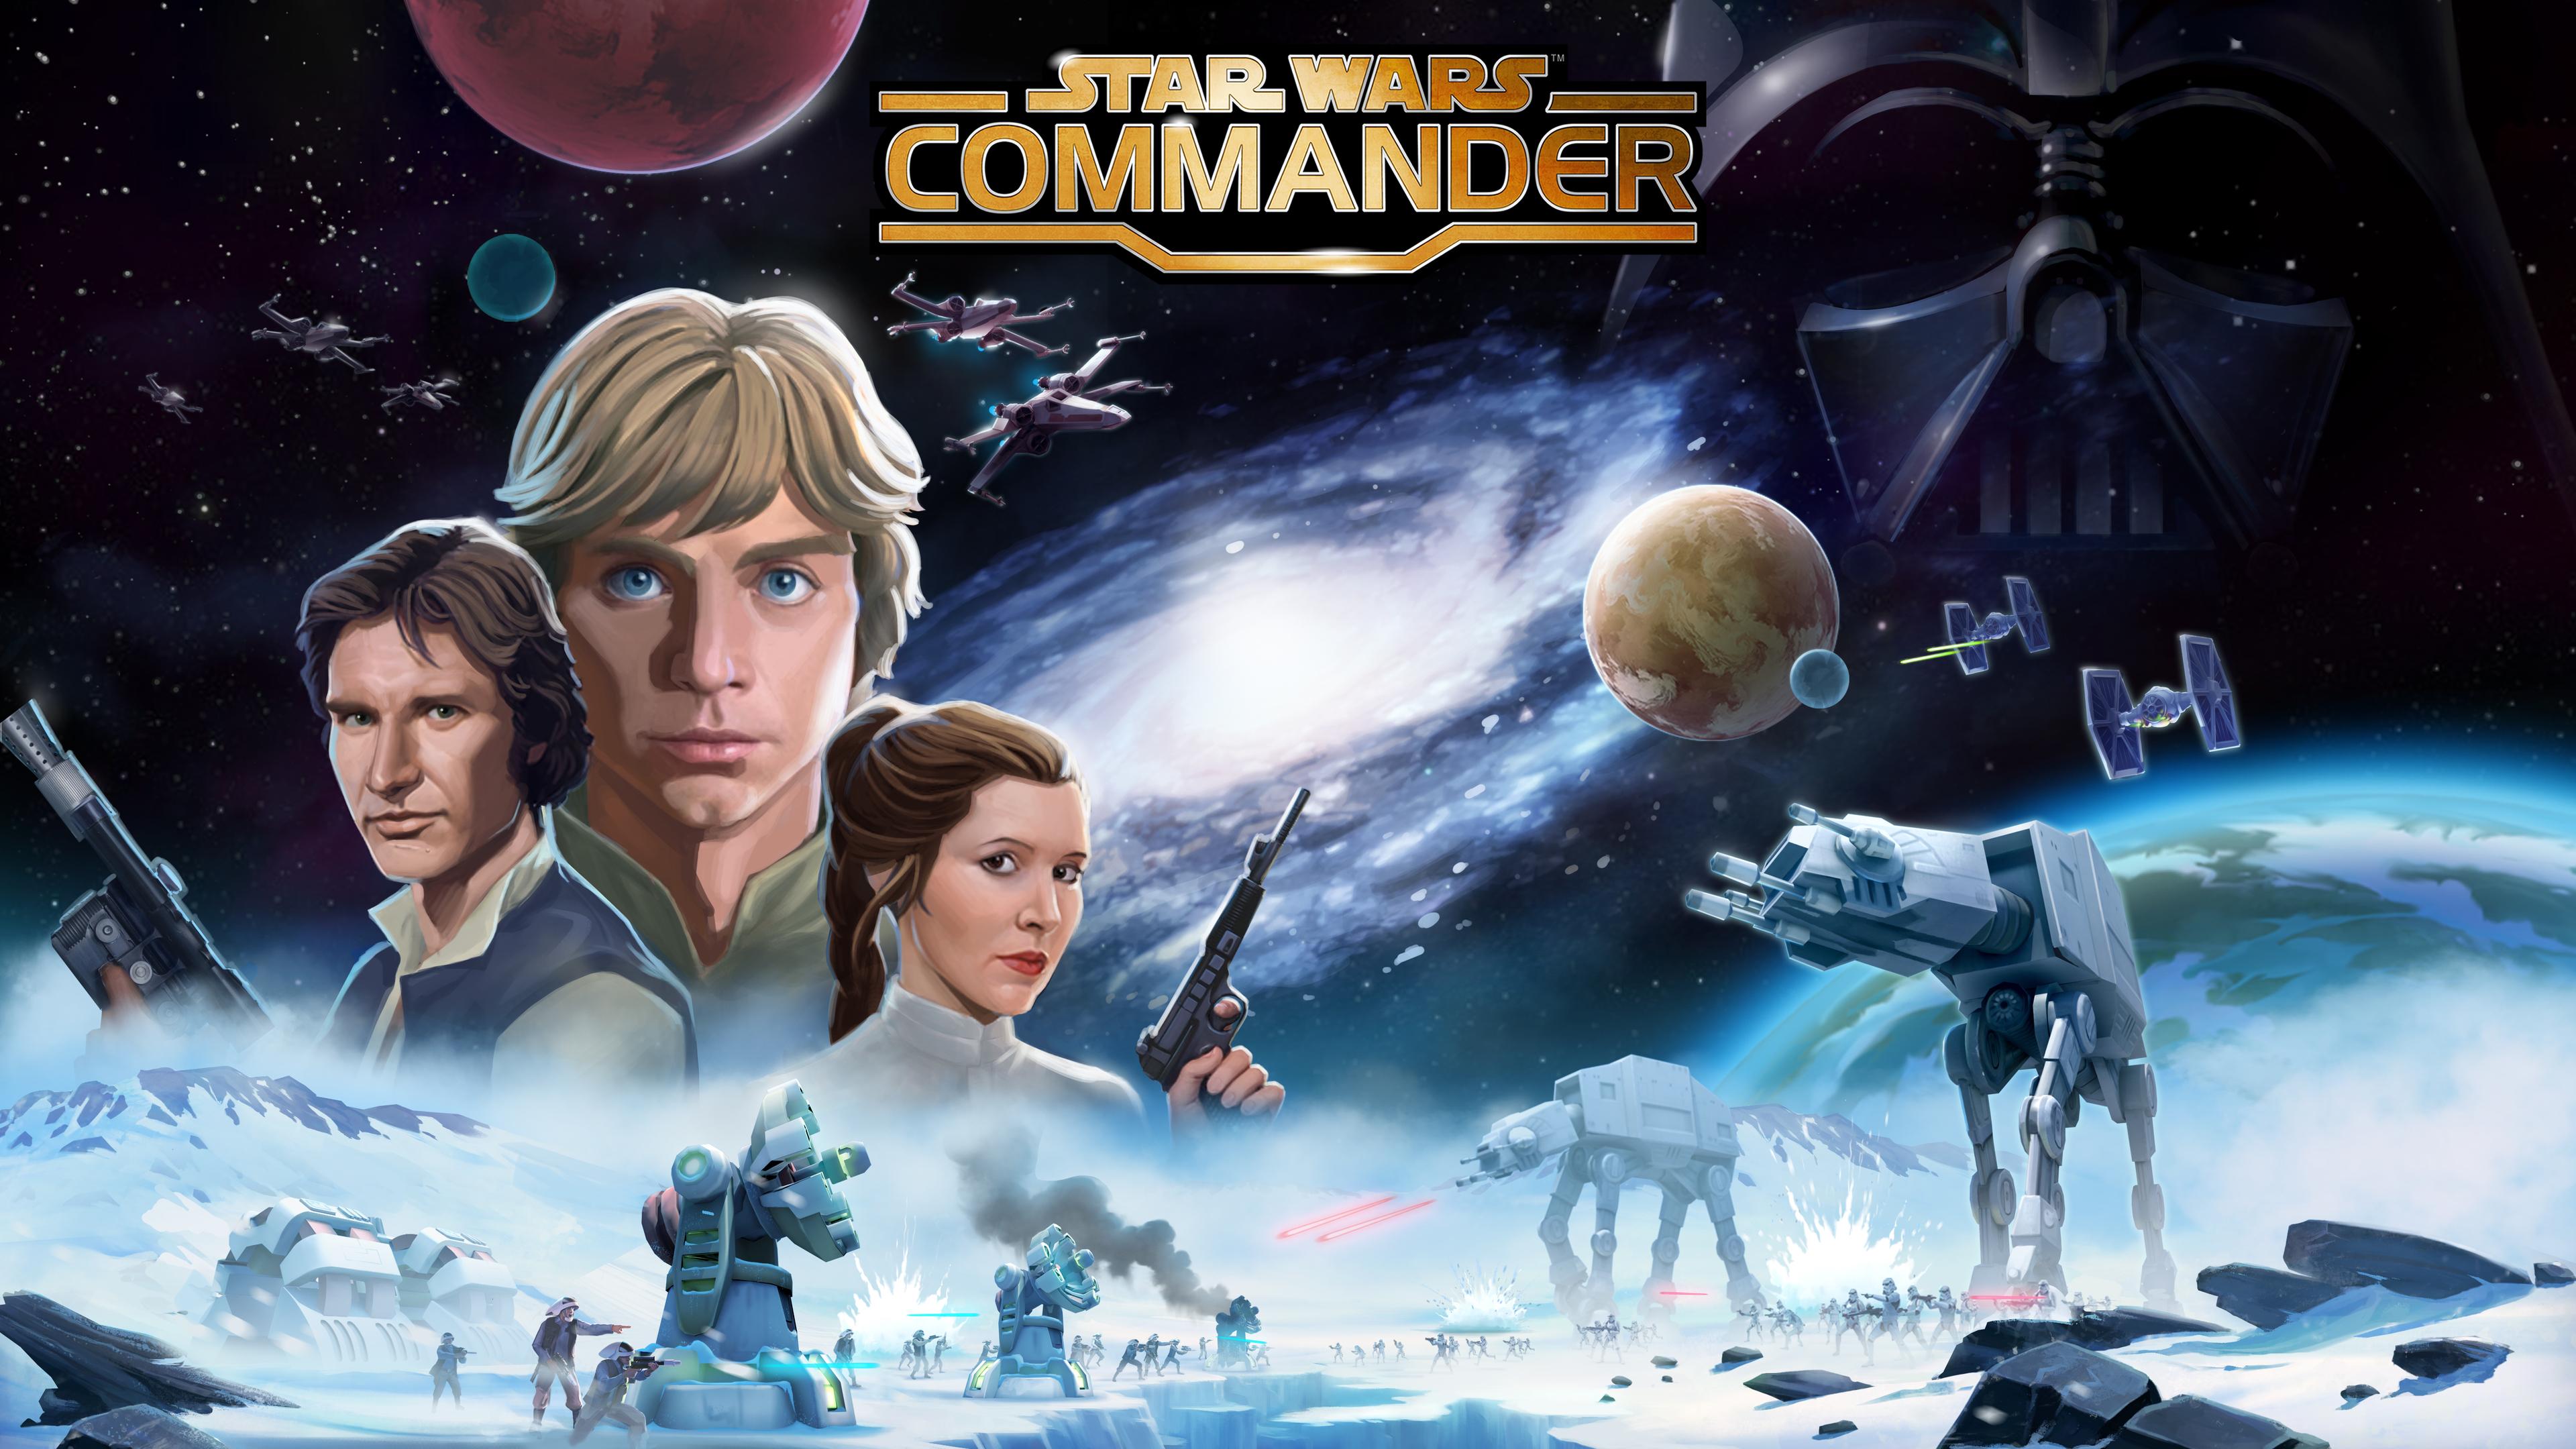 star wars commander strikes back 1558221276 - Star Wars Commander Strikes Back - star wars wallpapers, hd-wallpapers, games wallpapers, 4k-wallpapers